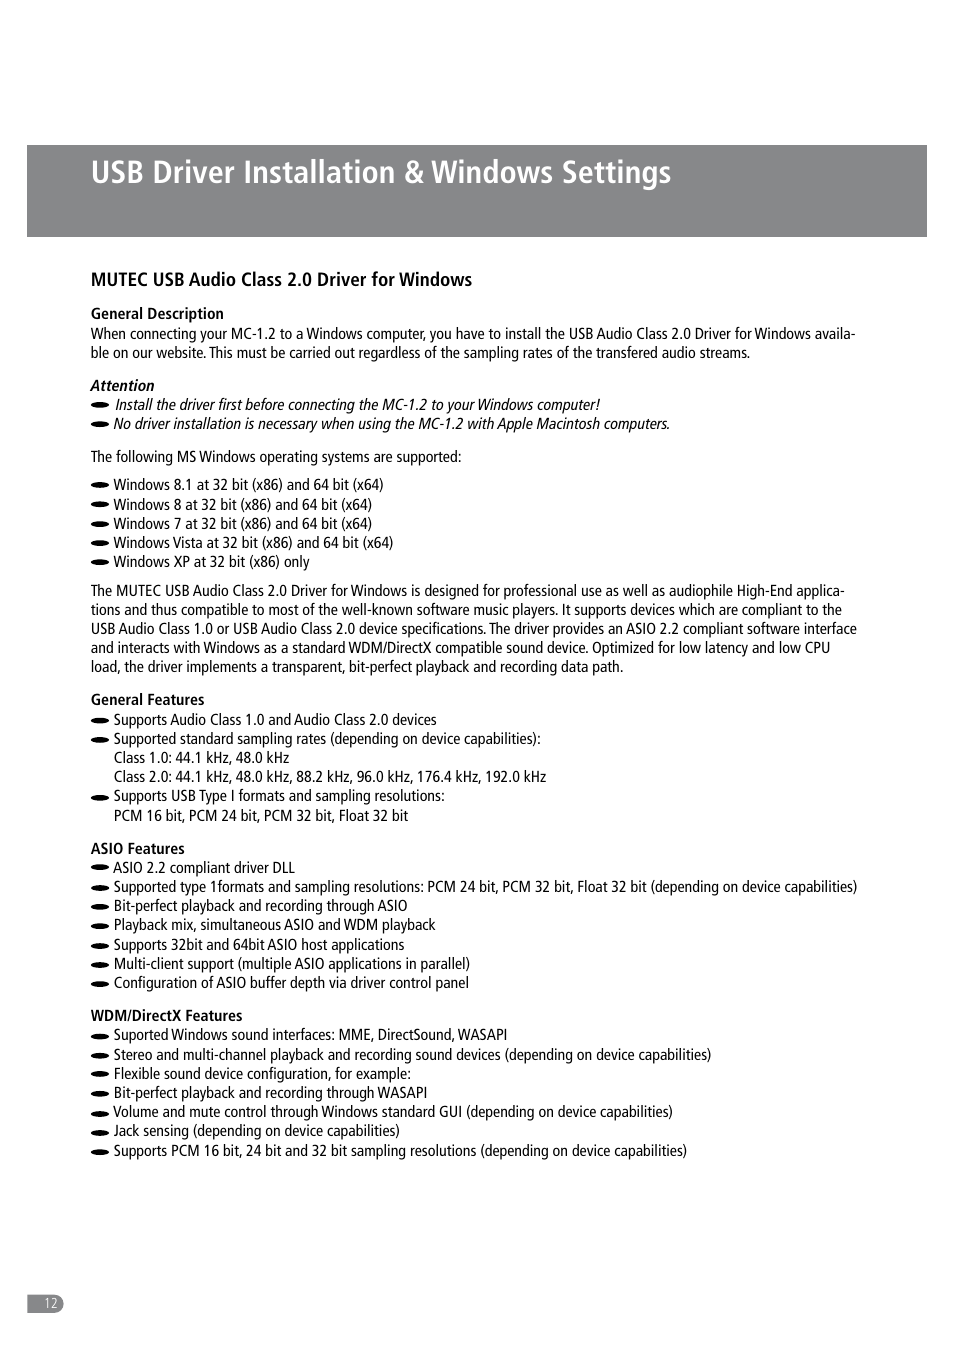 Usb driver installation & windows settings   MUTEC MC-1 2 User